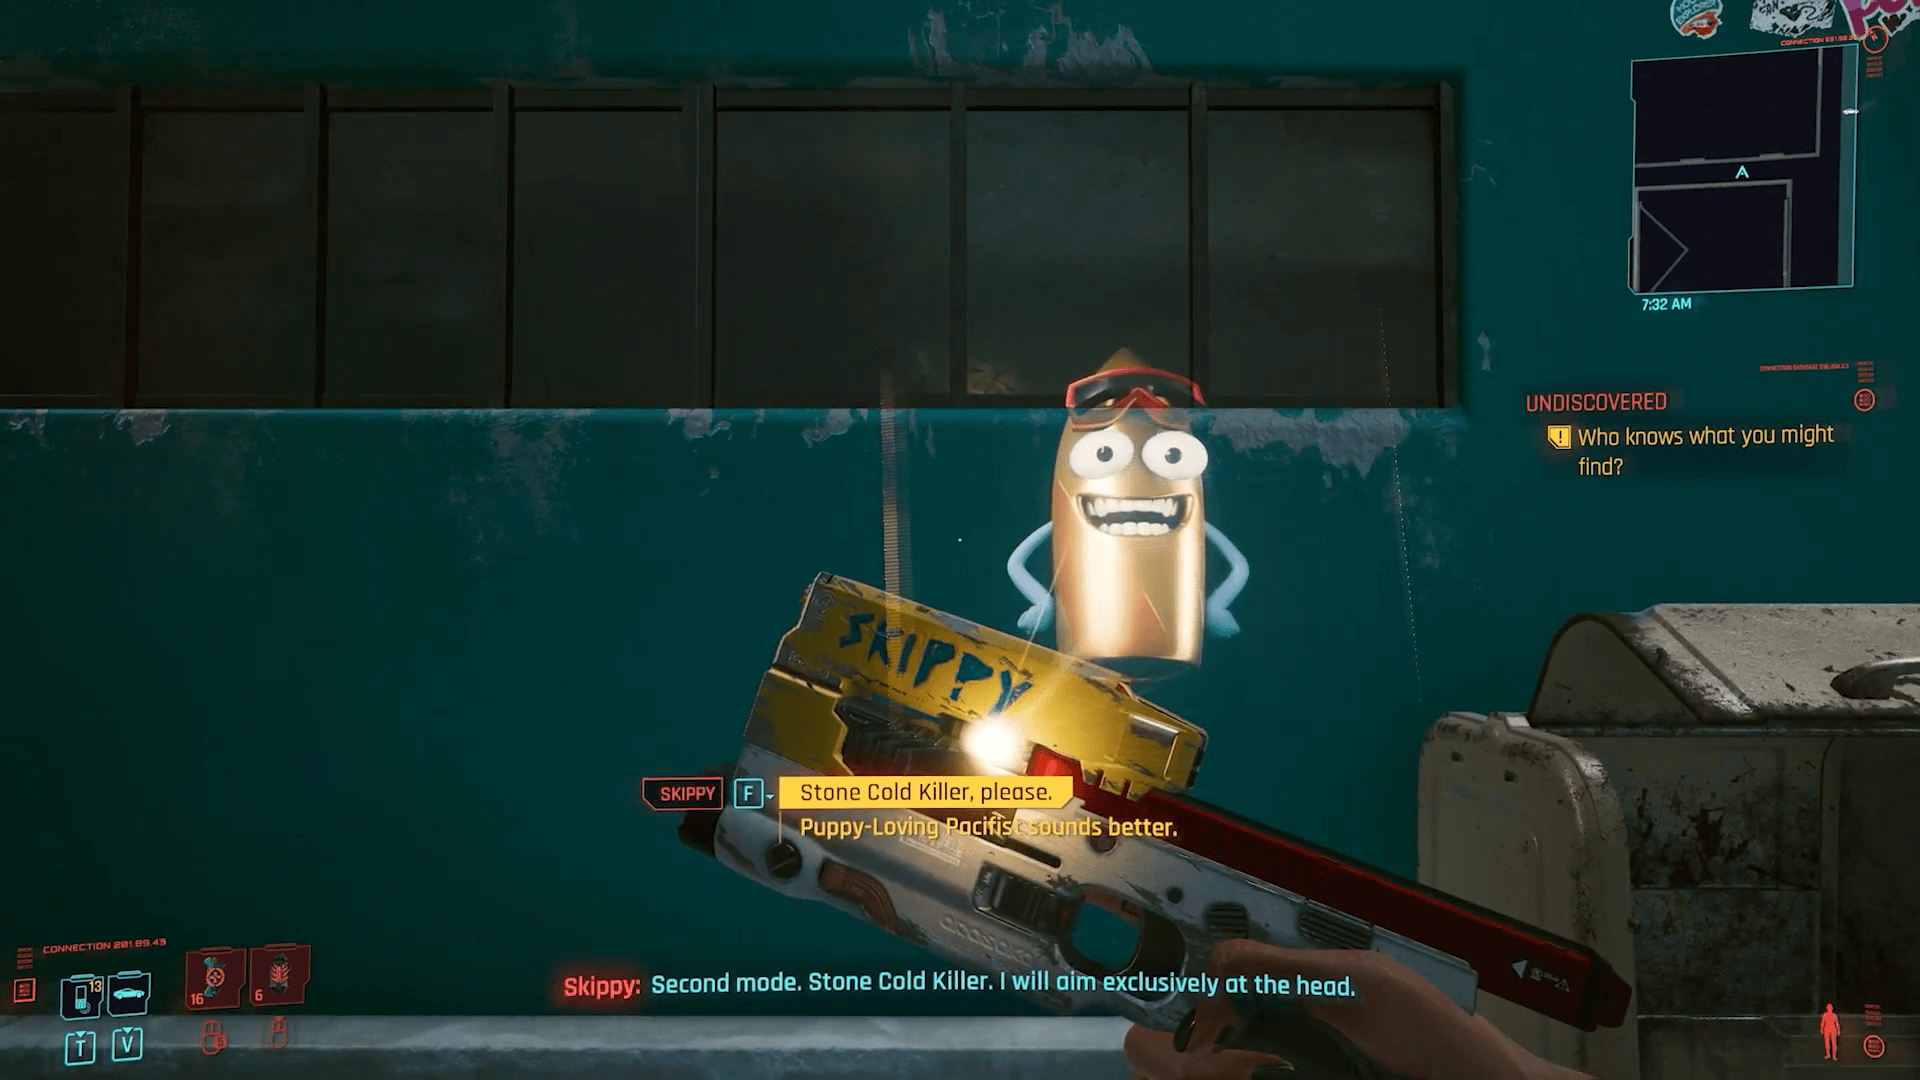 Cyberpunk 2077 skippy location